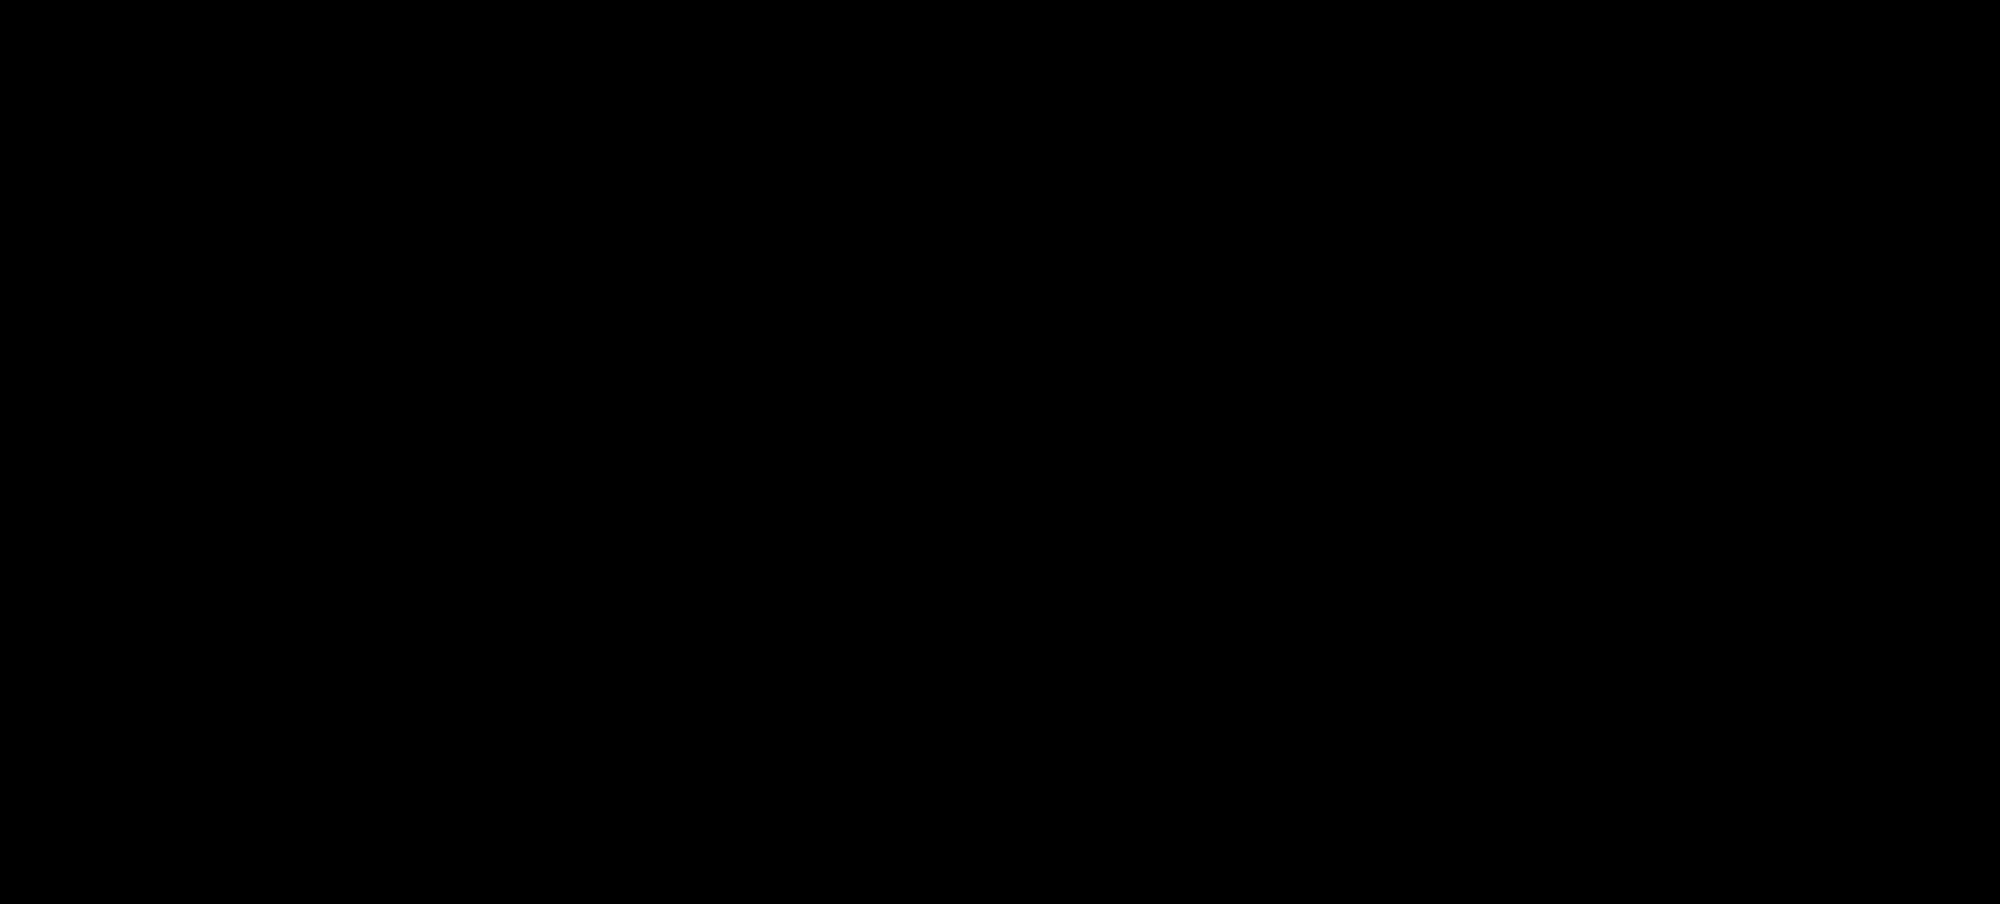 logo_suricat_senza_sfondo